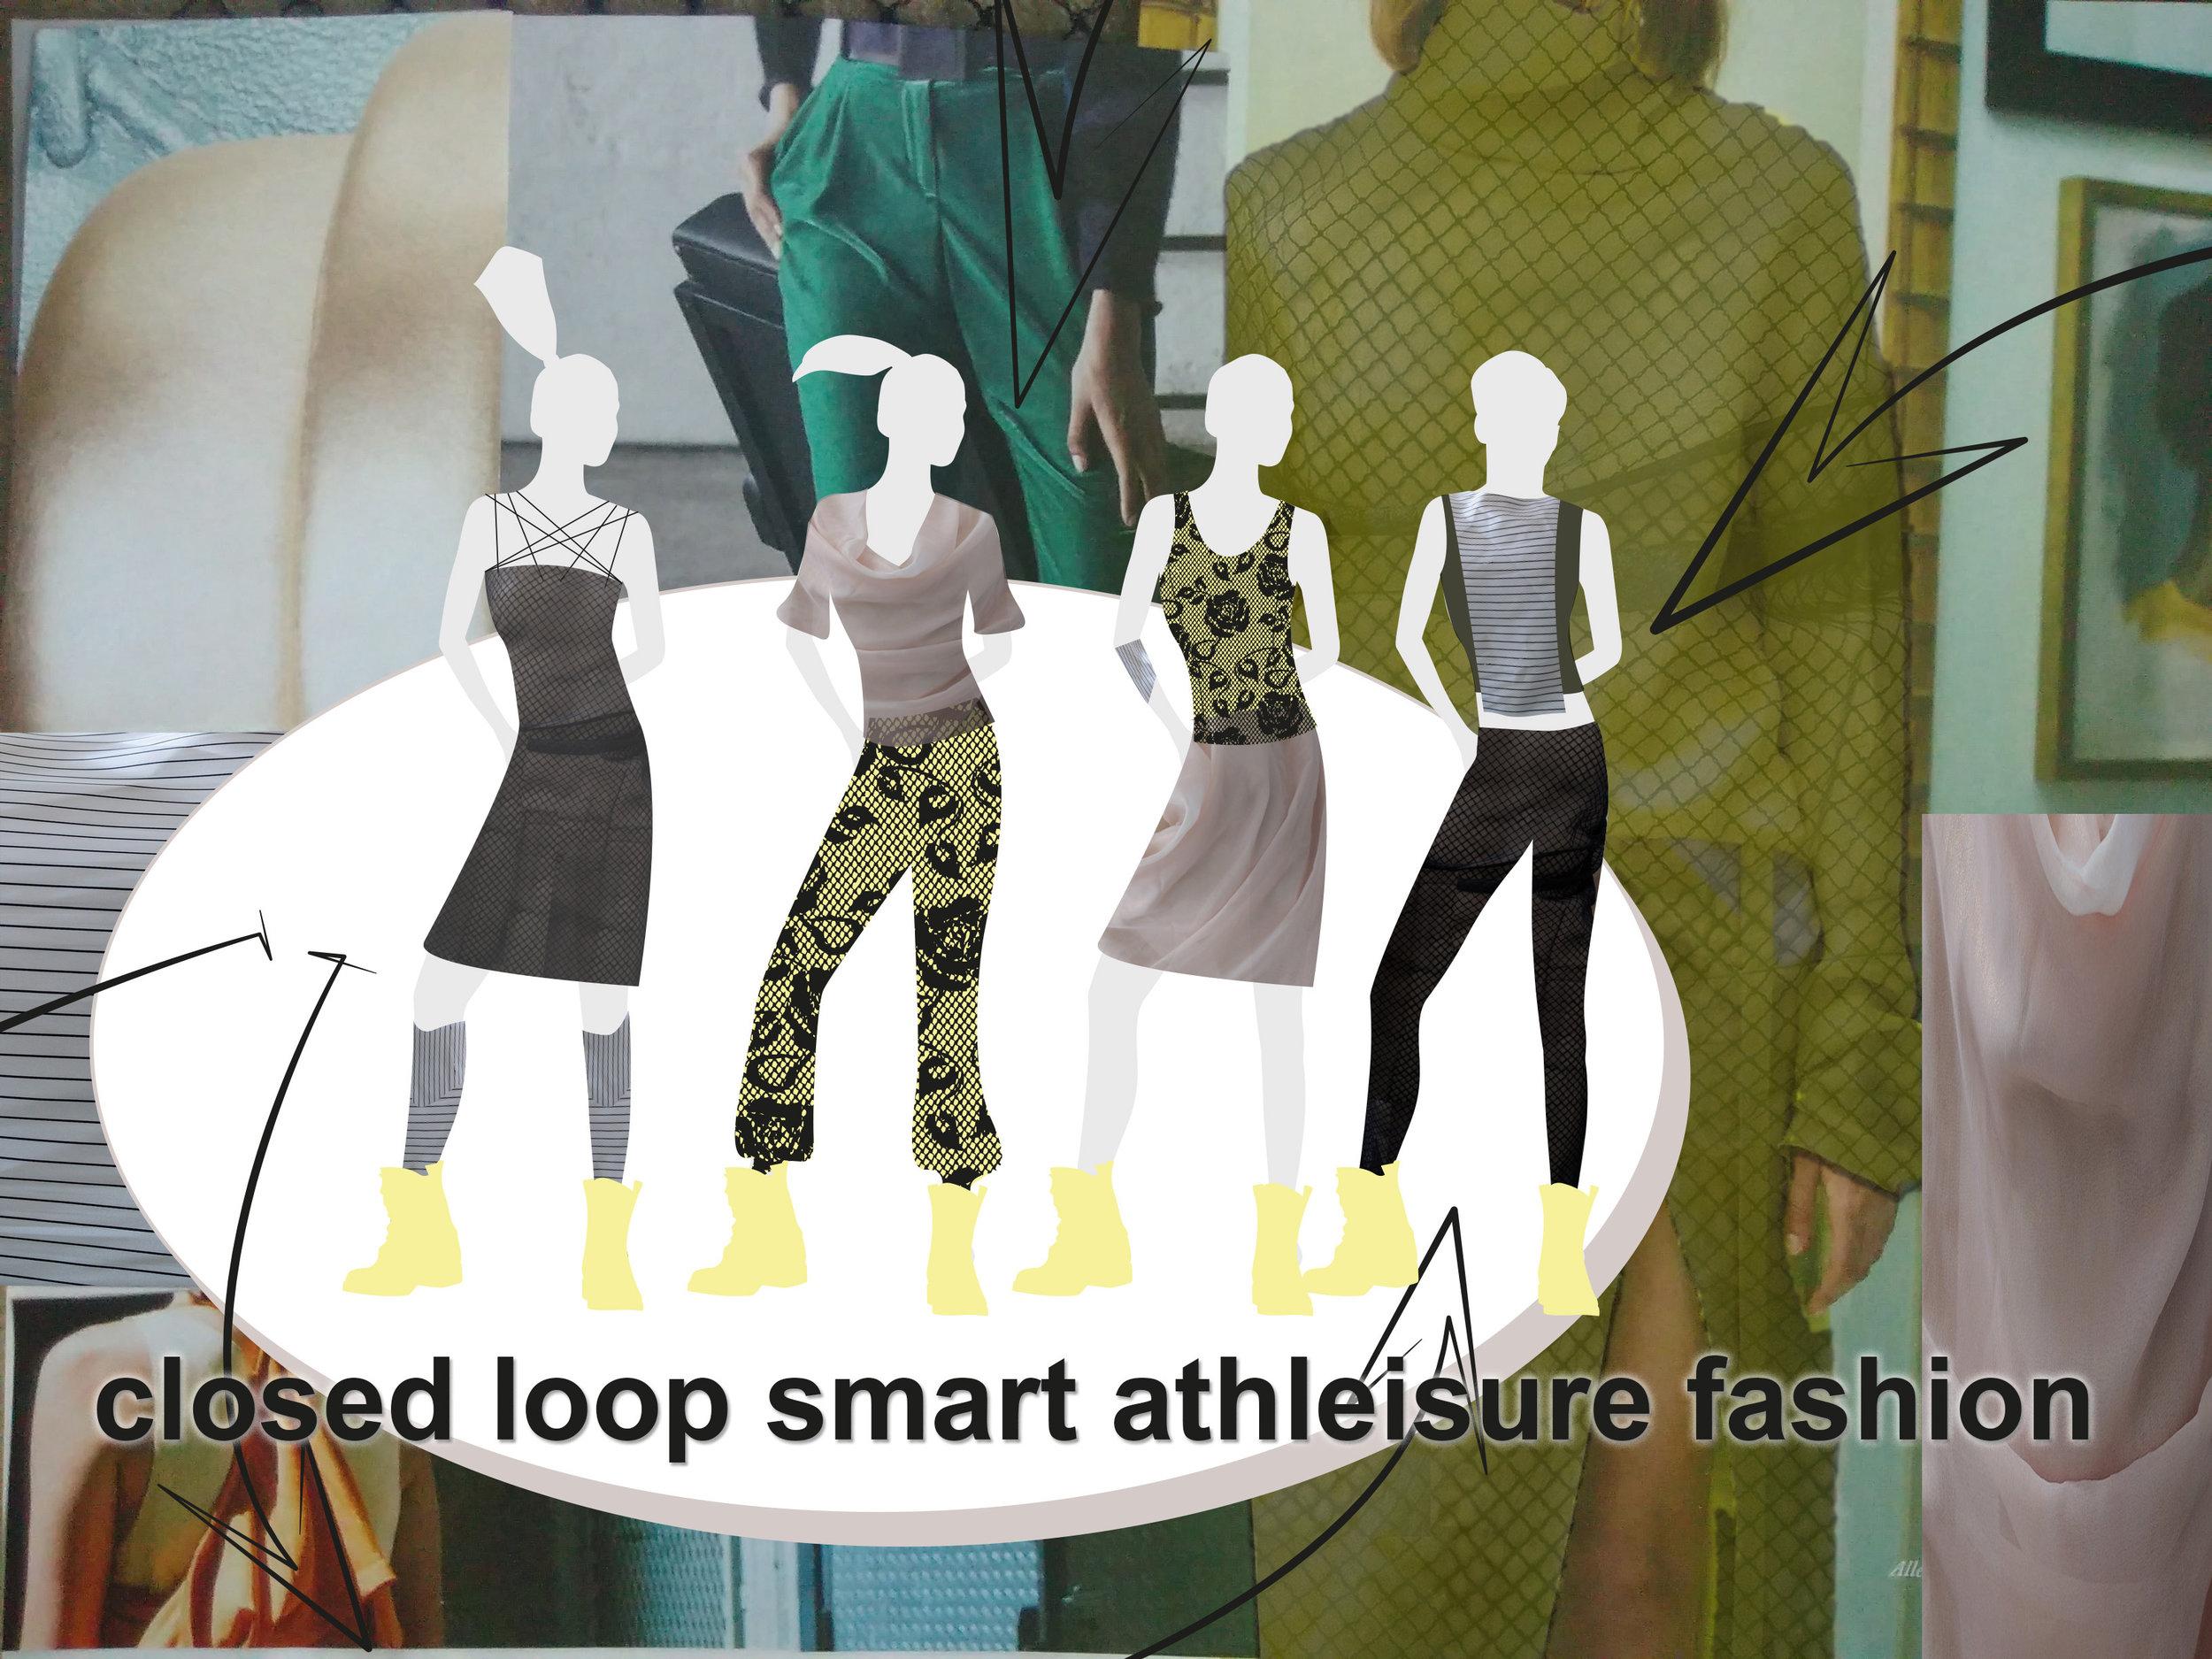 1closed_loop_smart_athleisure_fashion_title (1).jpg